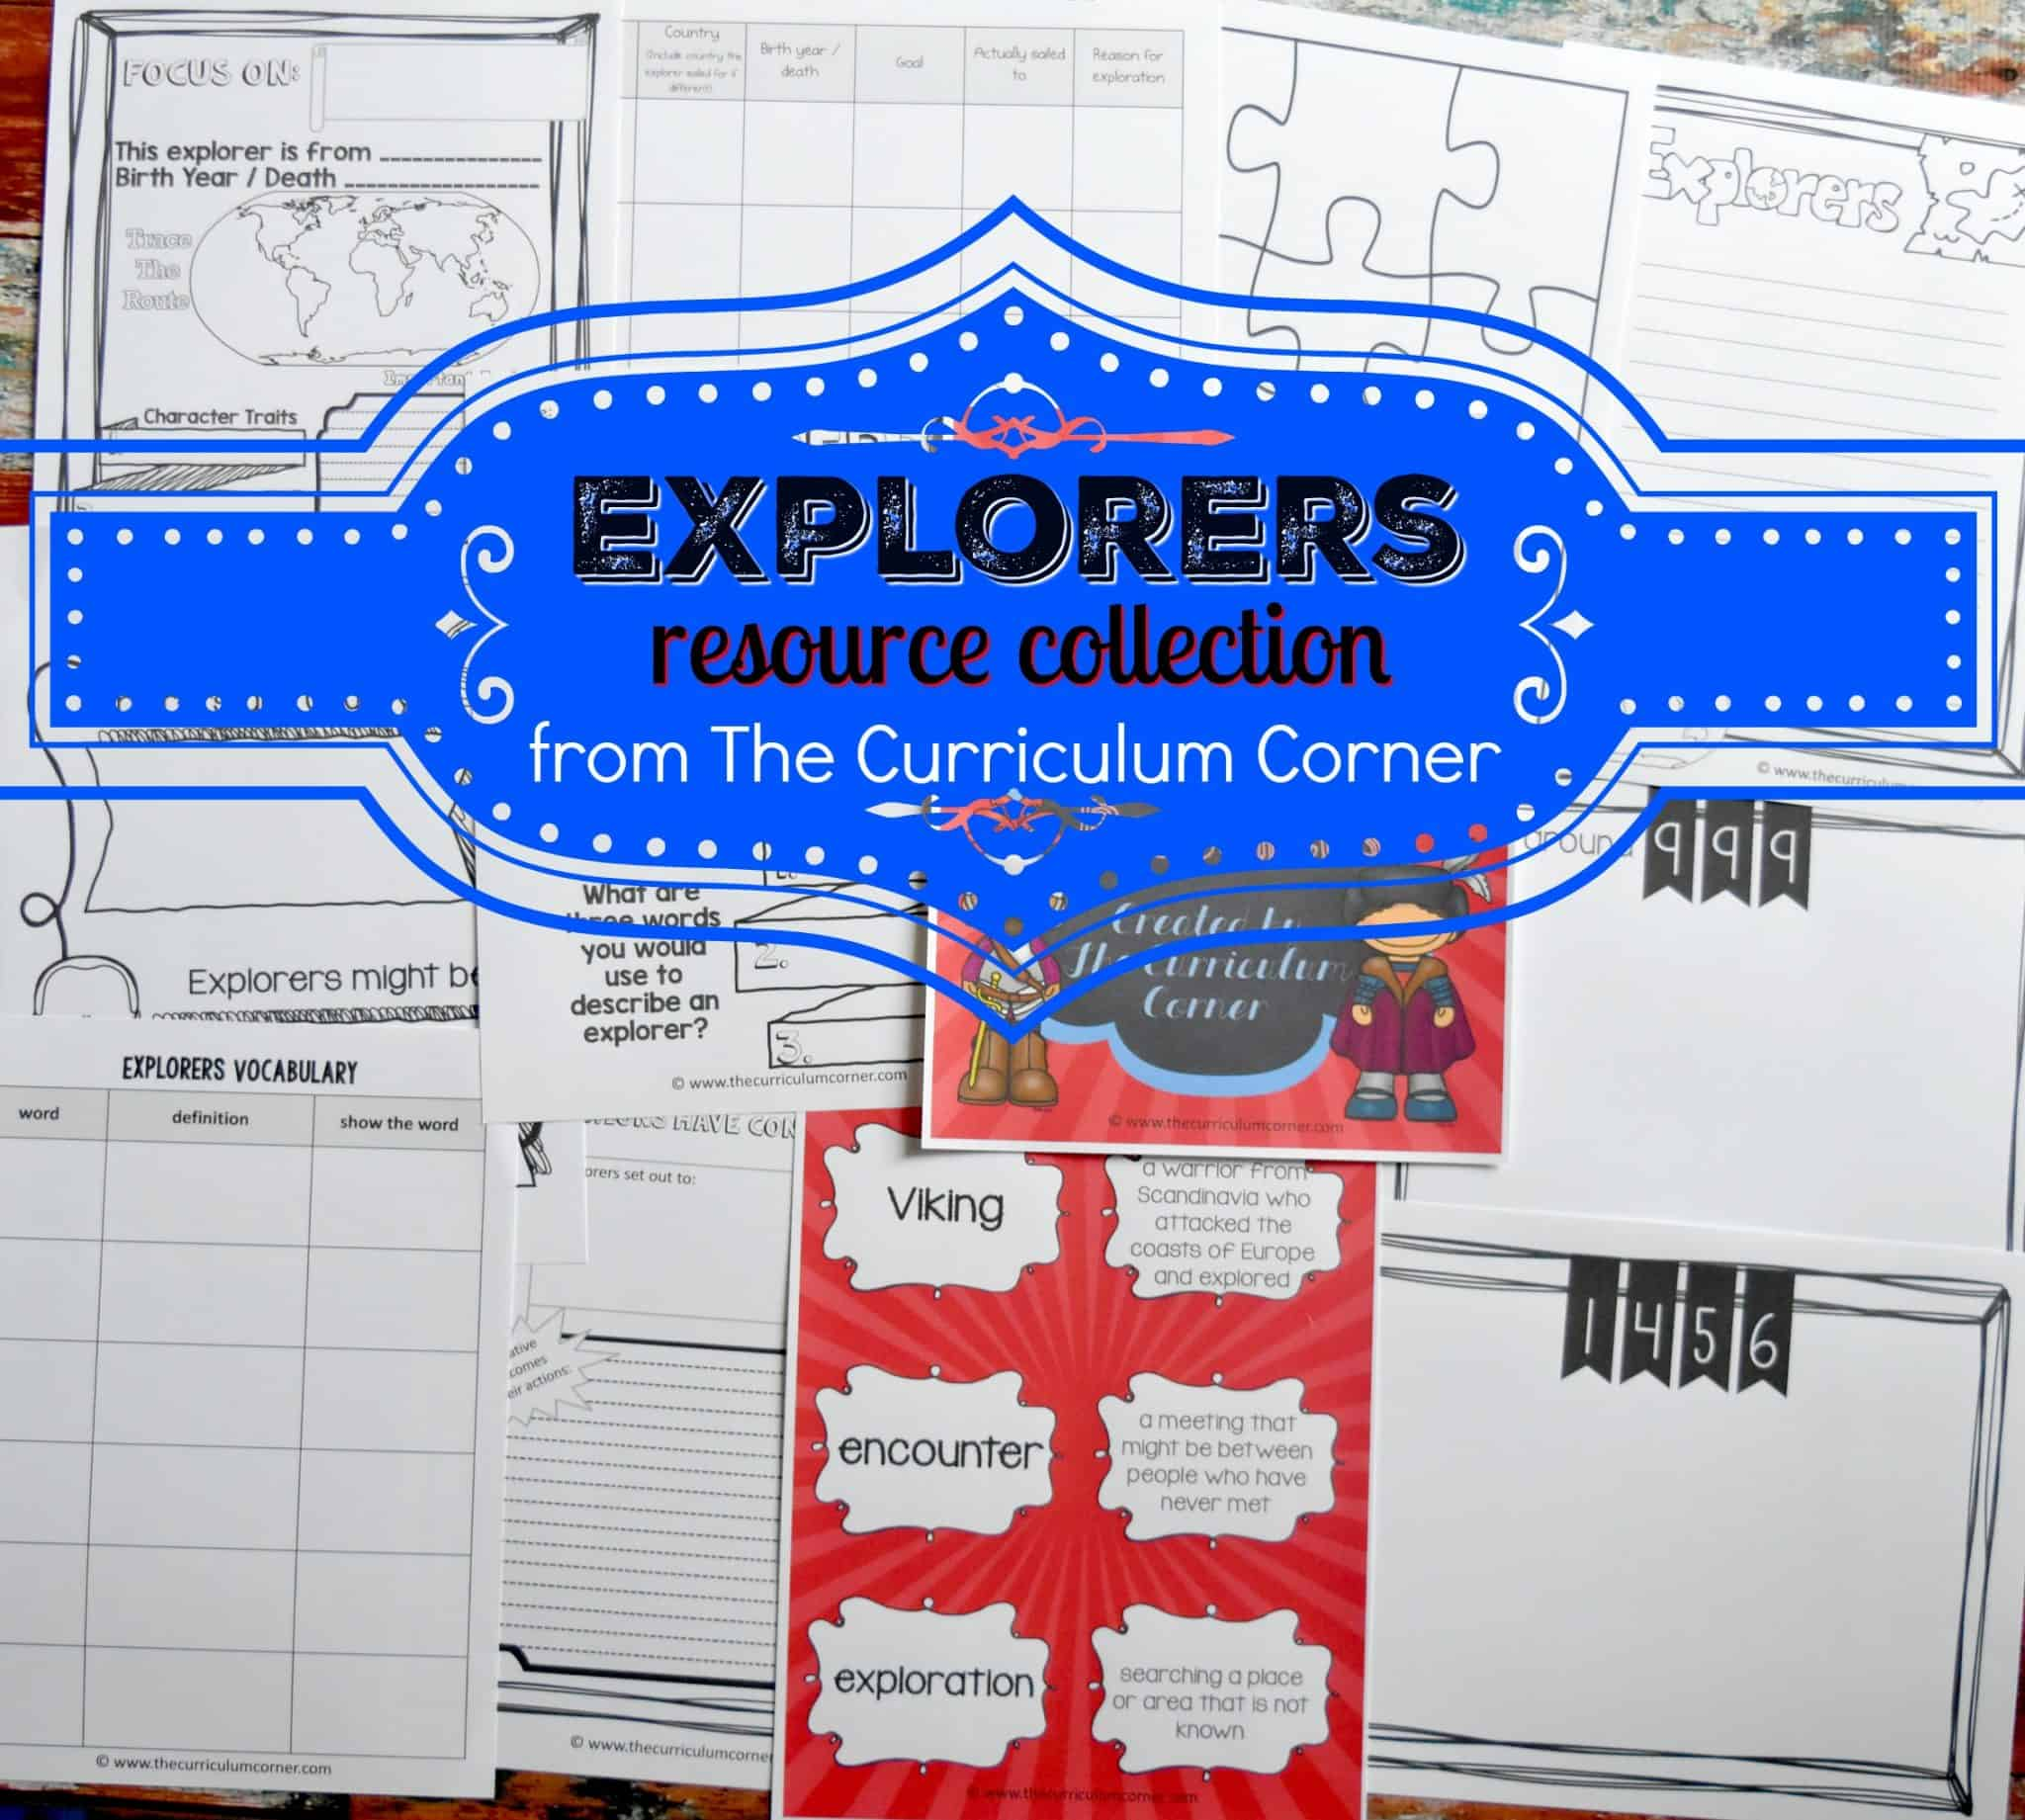 Focus on Explorers